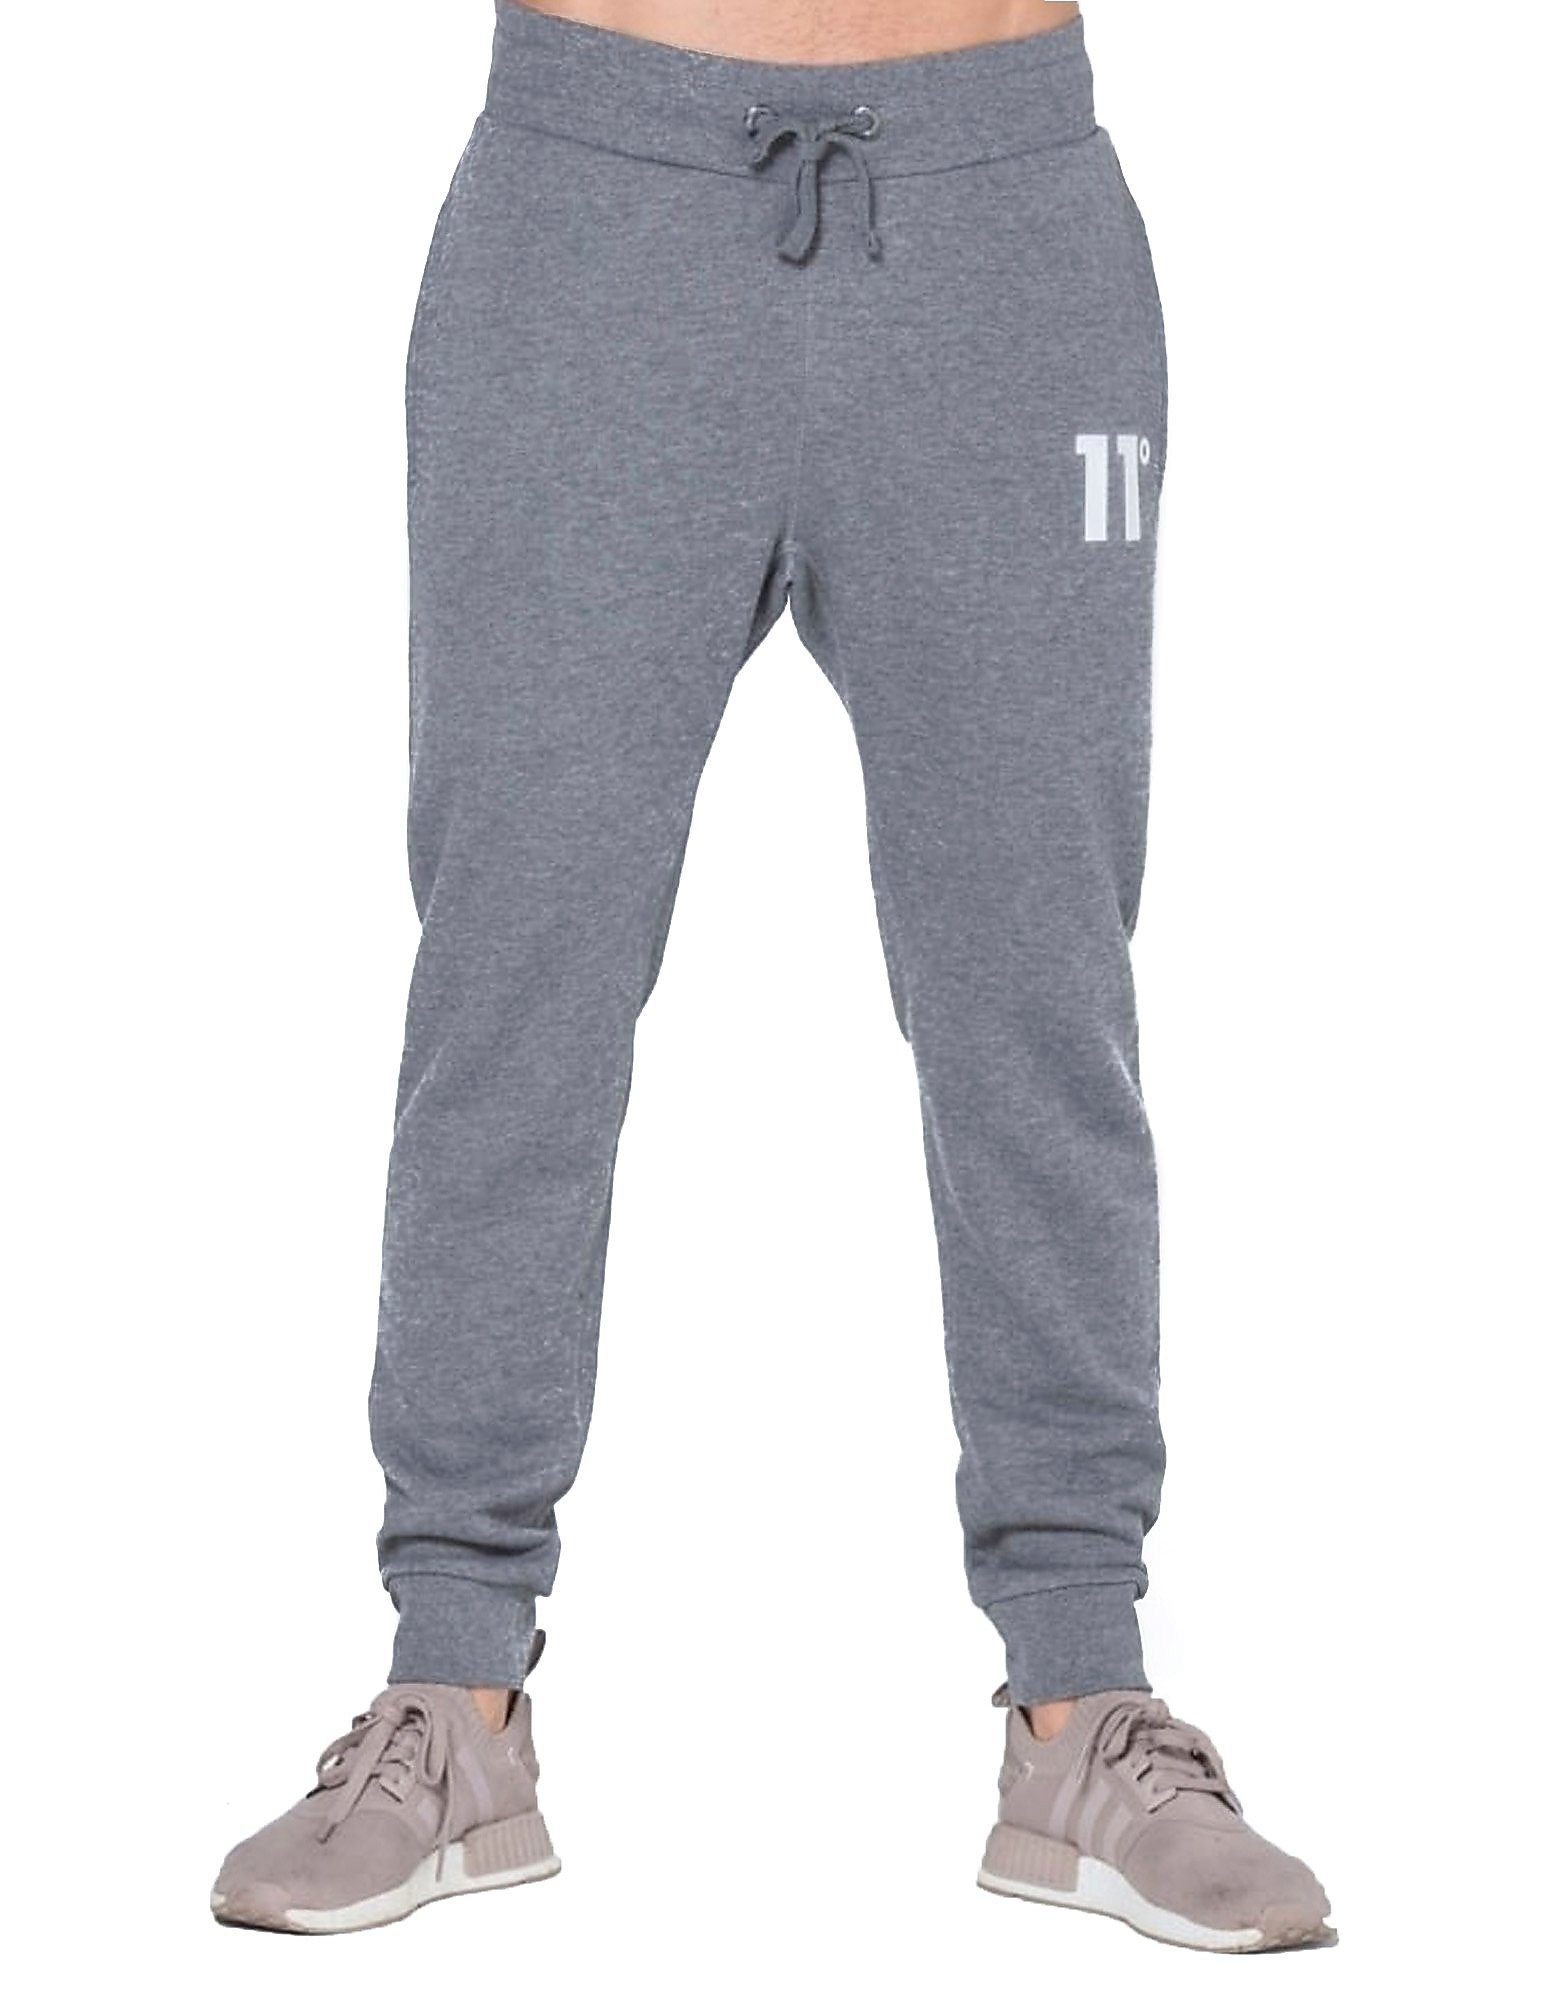 11 Degrees Core Fleece Pantalon - gris, gris